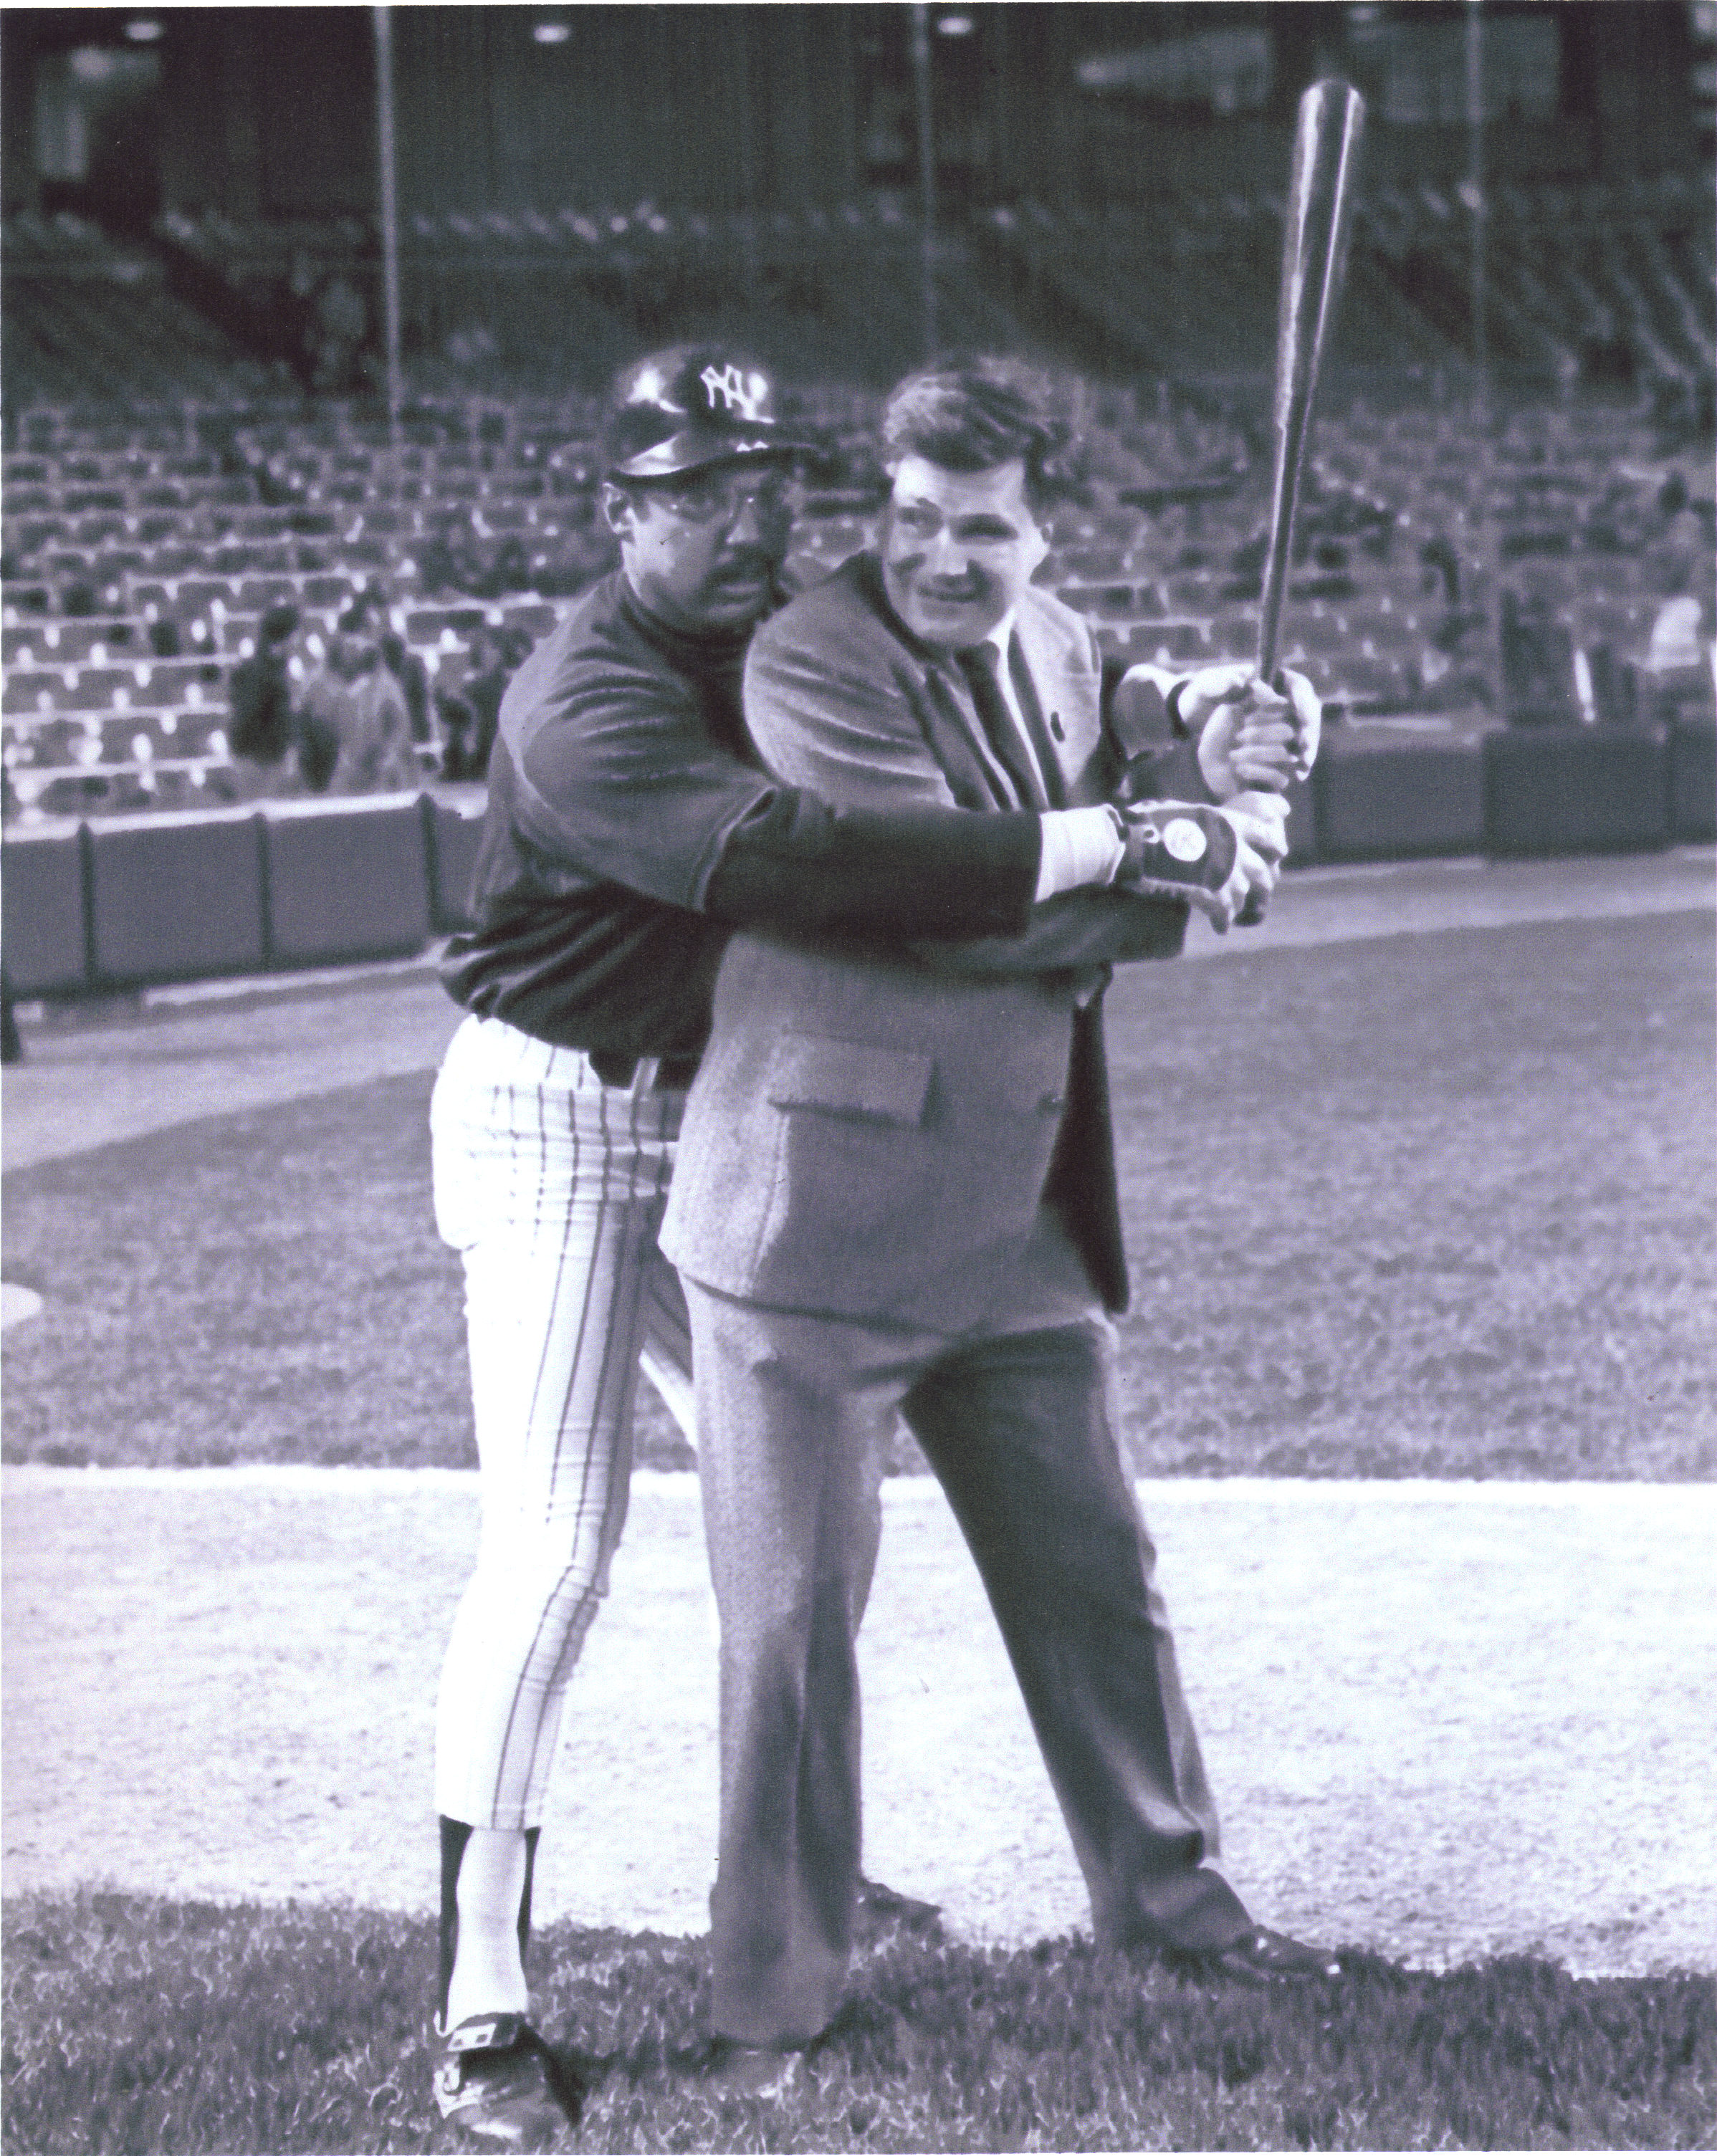 Ed and Reggie at Bat.jpg